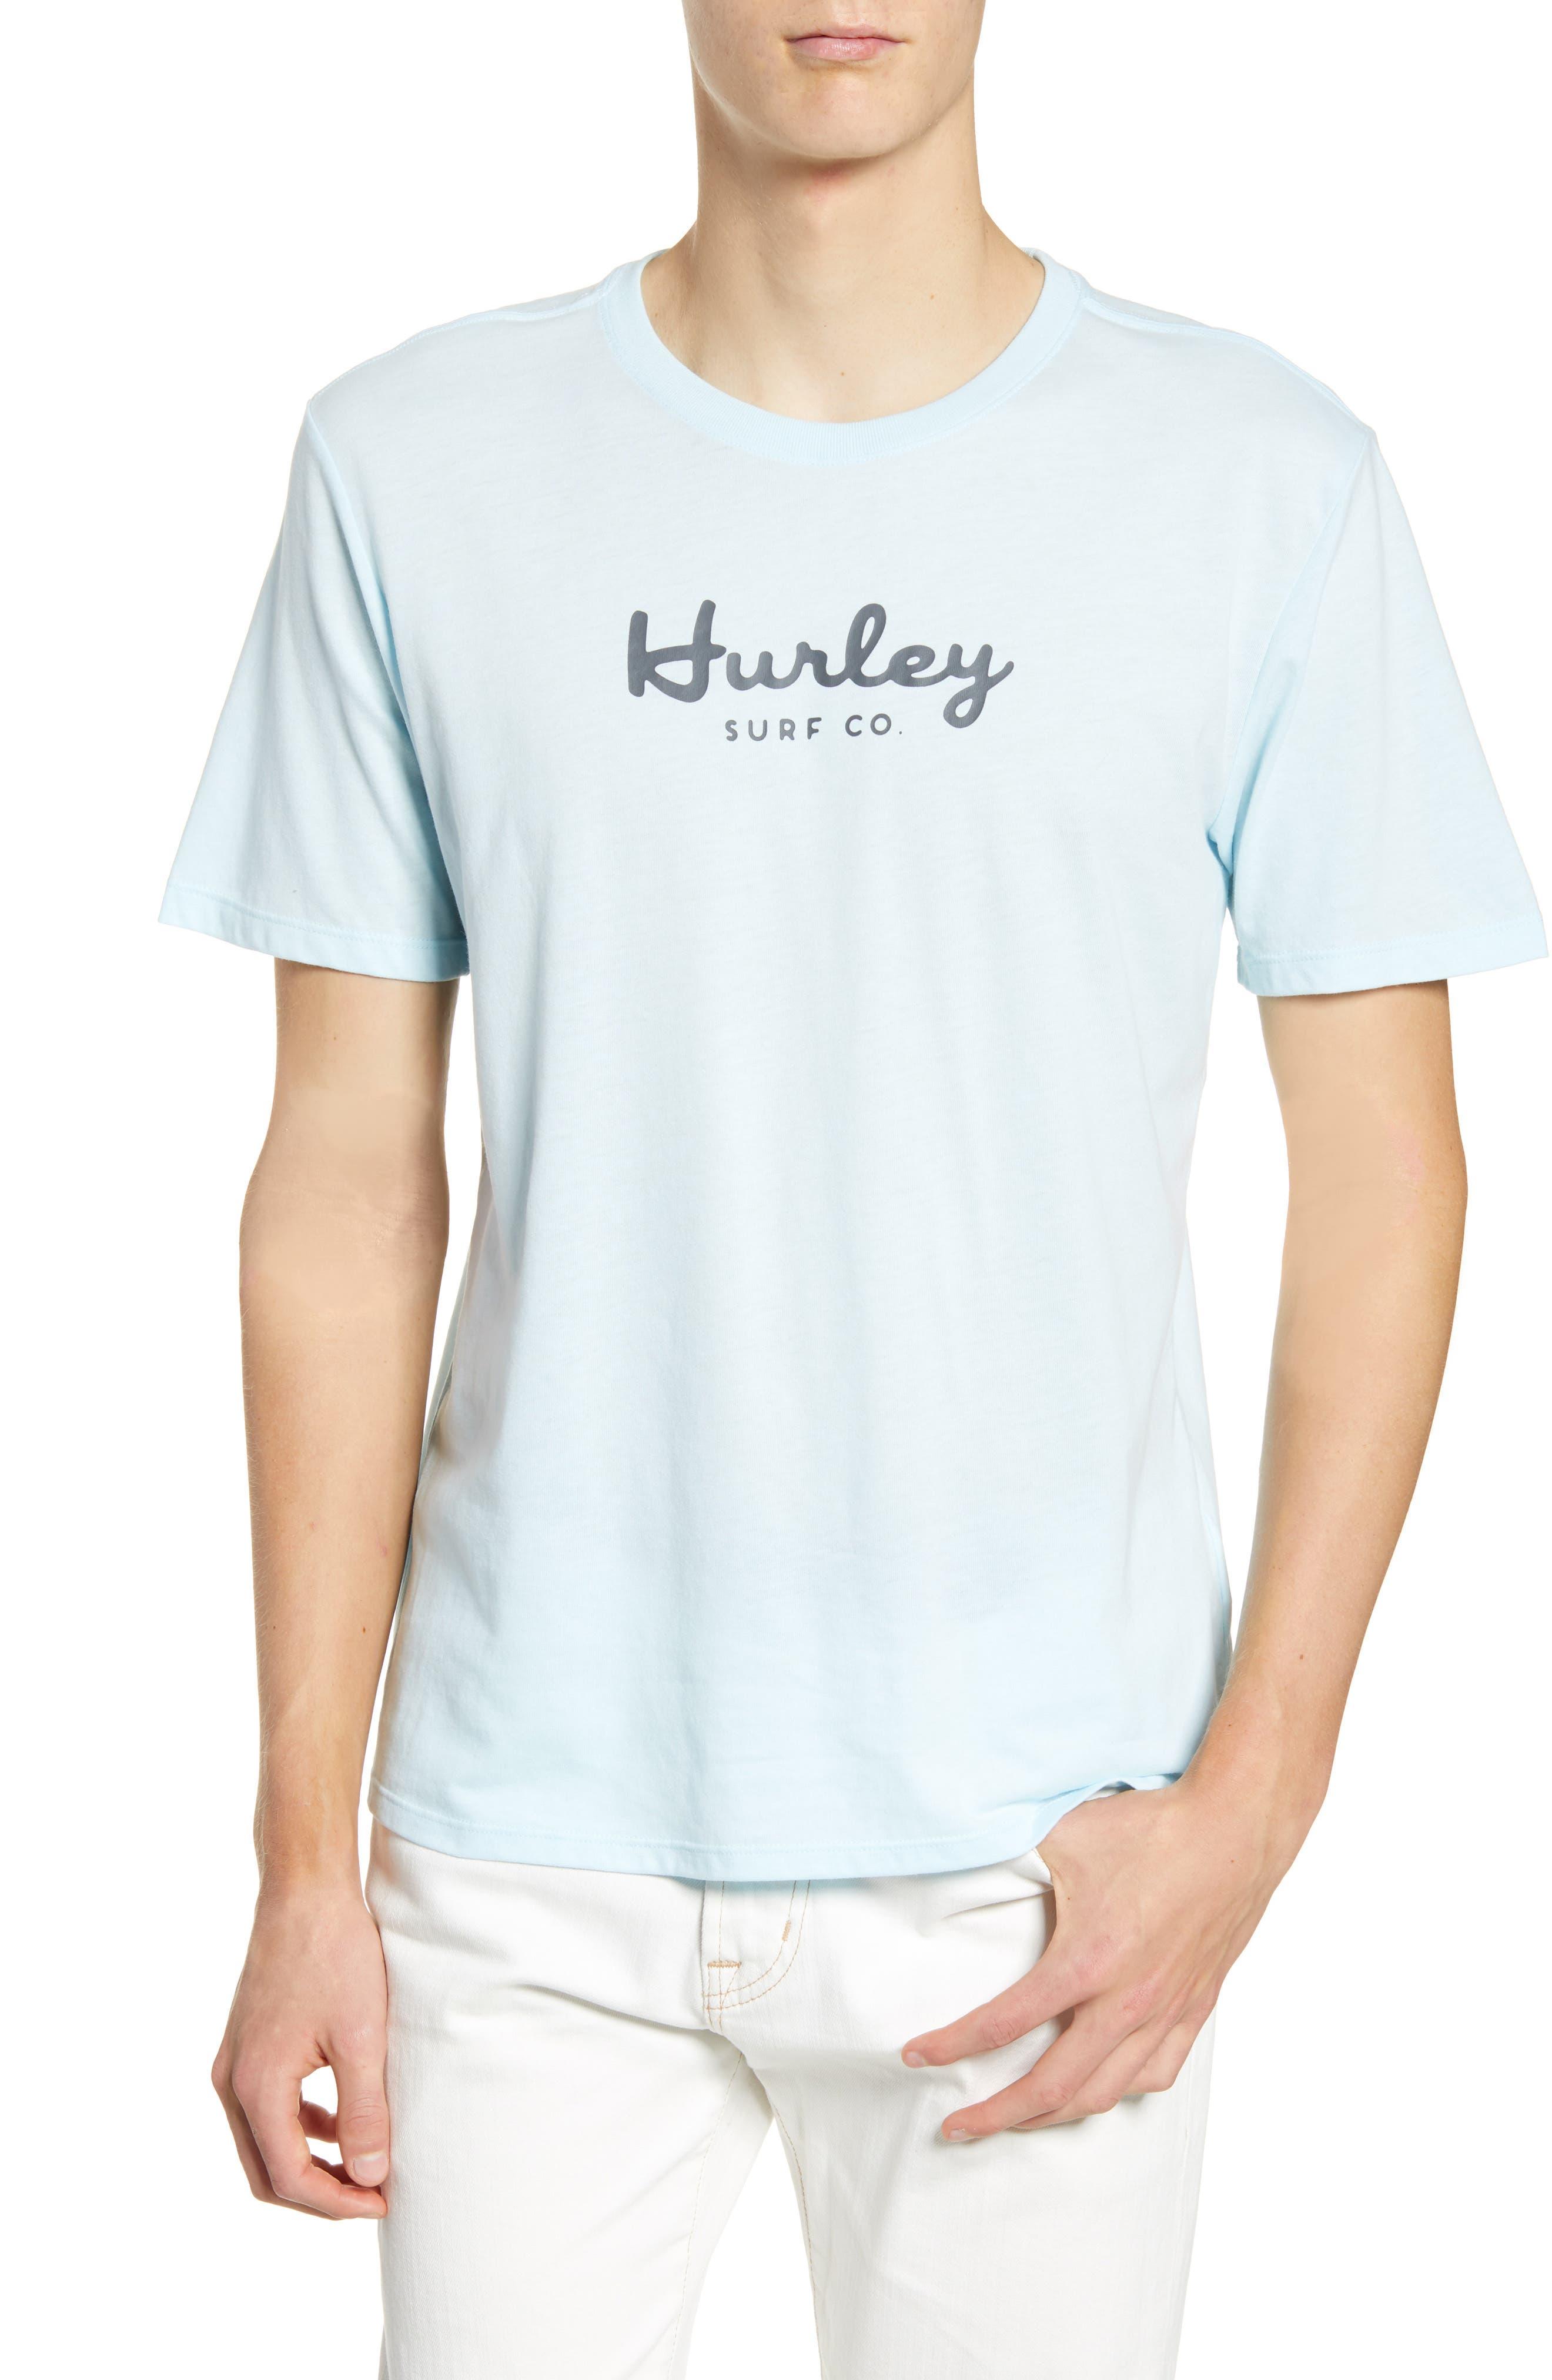 5c32c0e7d Hurley Men's T-Shirts, stylish comfort clothing